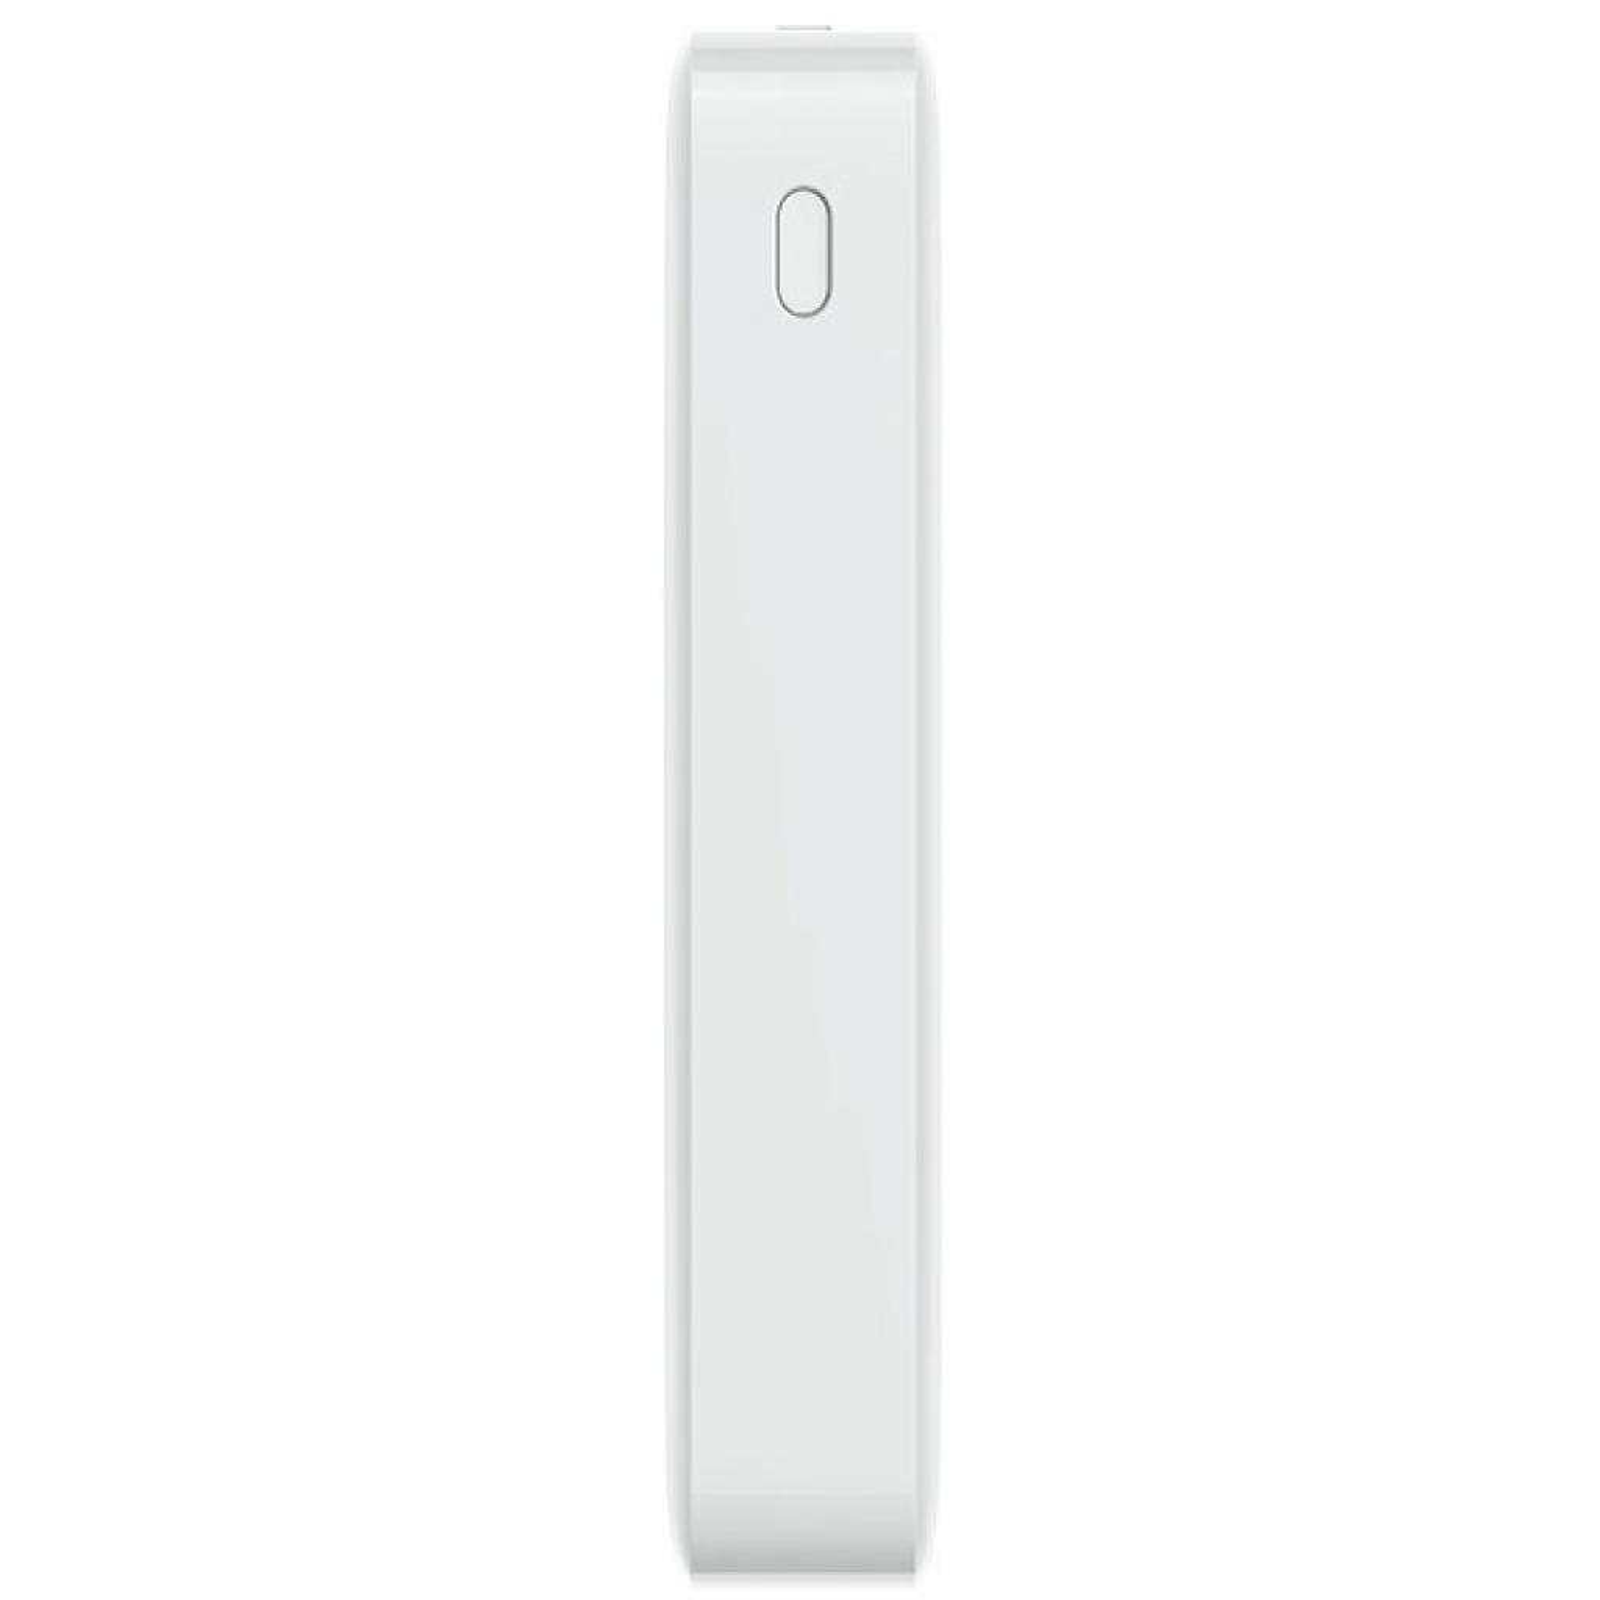 Батарея универсальная Xiaomi Redmi 20000mAh (in 2.1A Micro-USB,Type-C/ out 2*2.4A) White (VXN4265CN / VXN4285) изображение 4